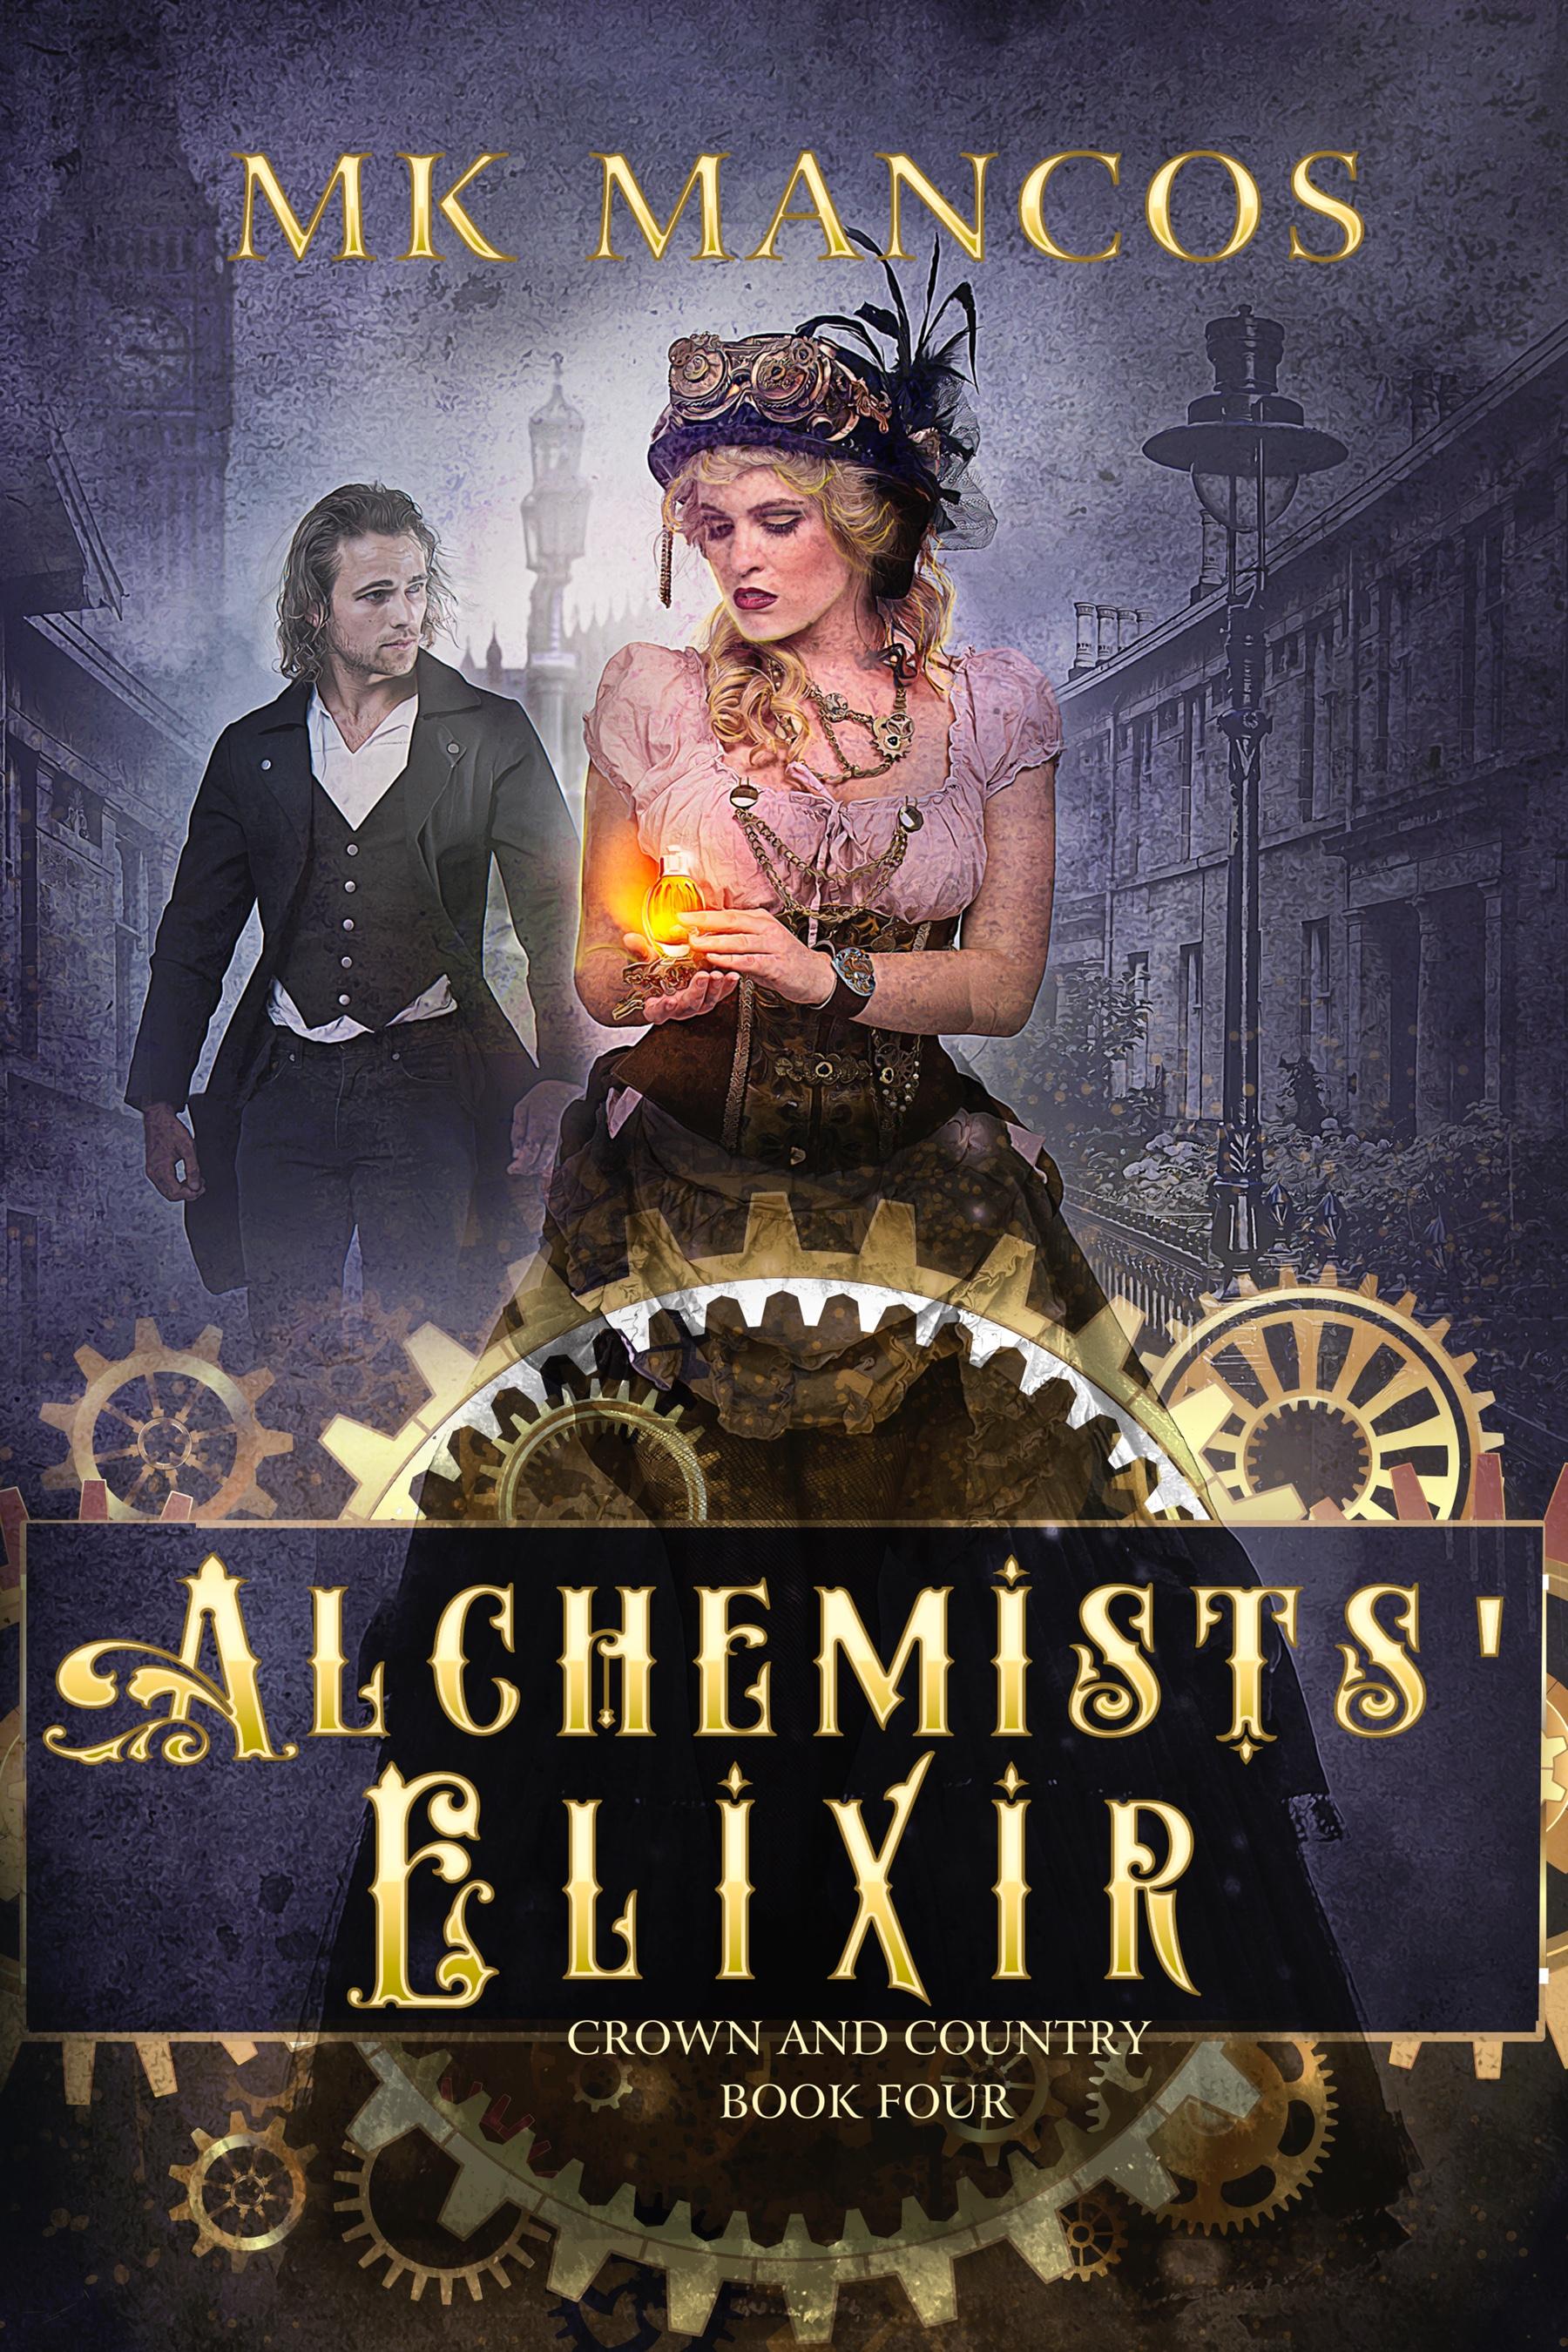 AlchemistsElixirFinal-FJM_Kindle_1800x2700